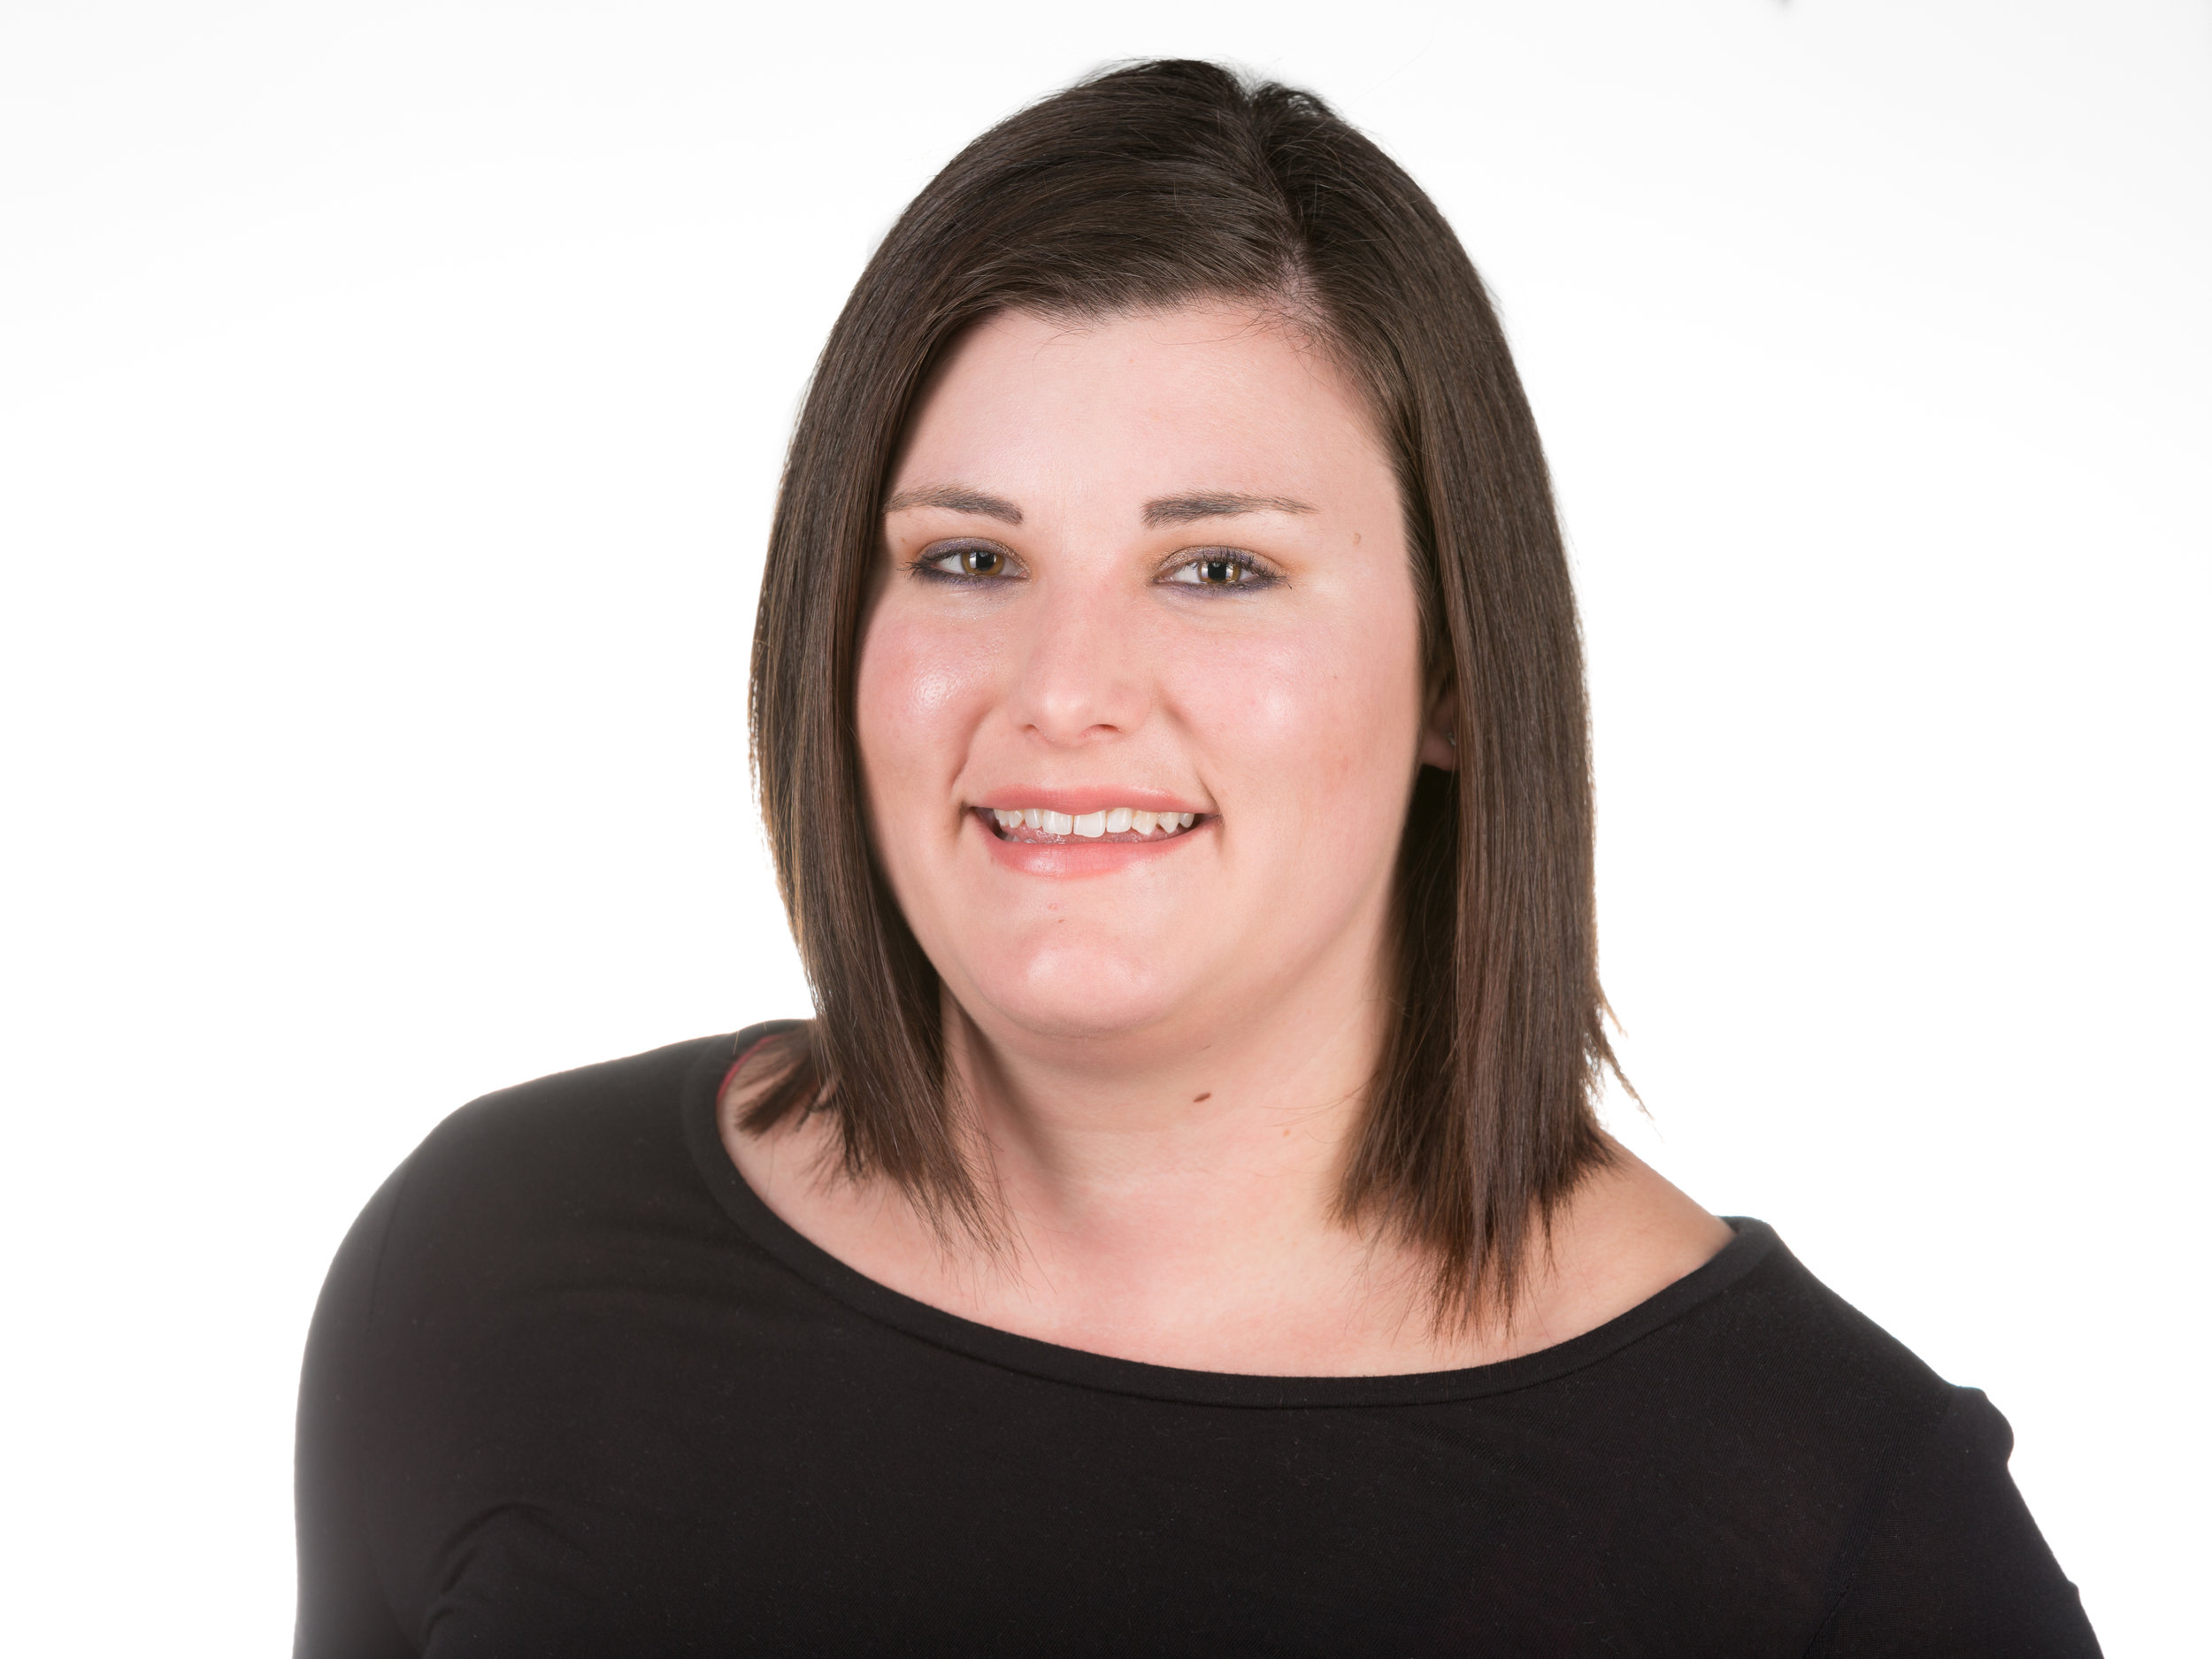 Nicole | MOTR/L | Motor Department Supervisor